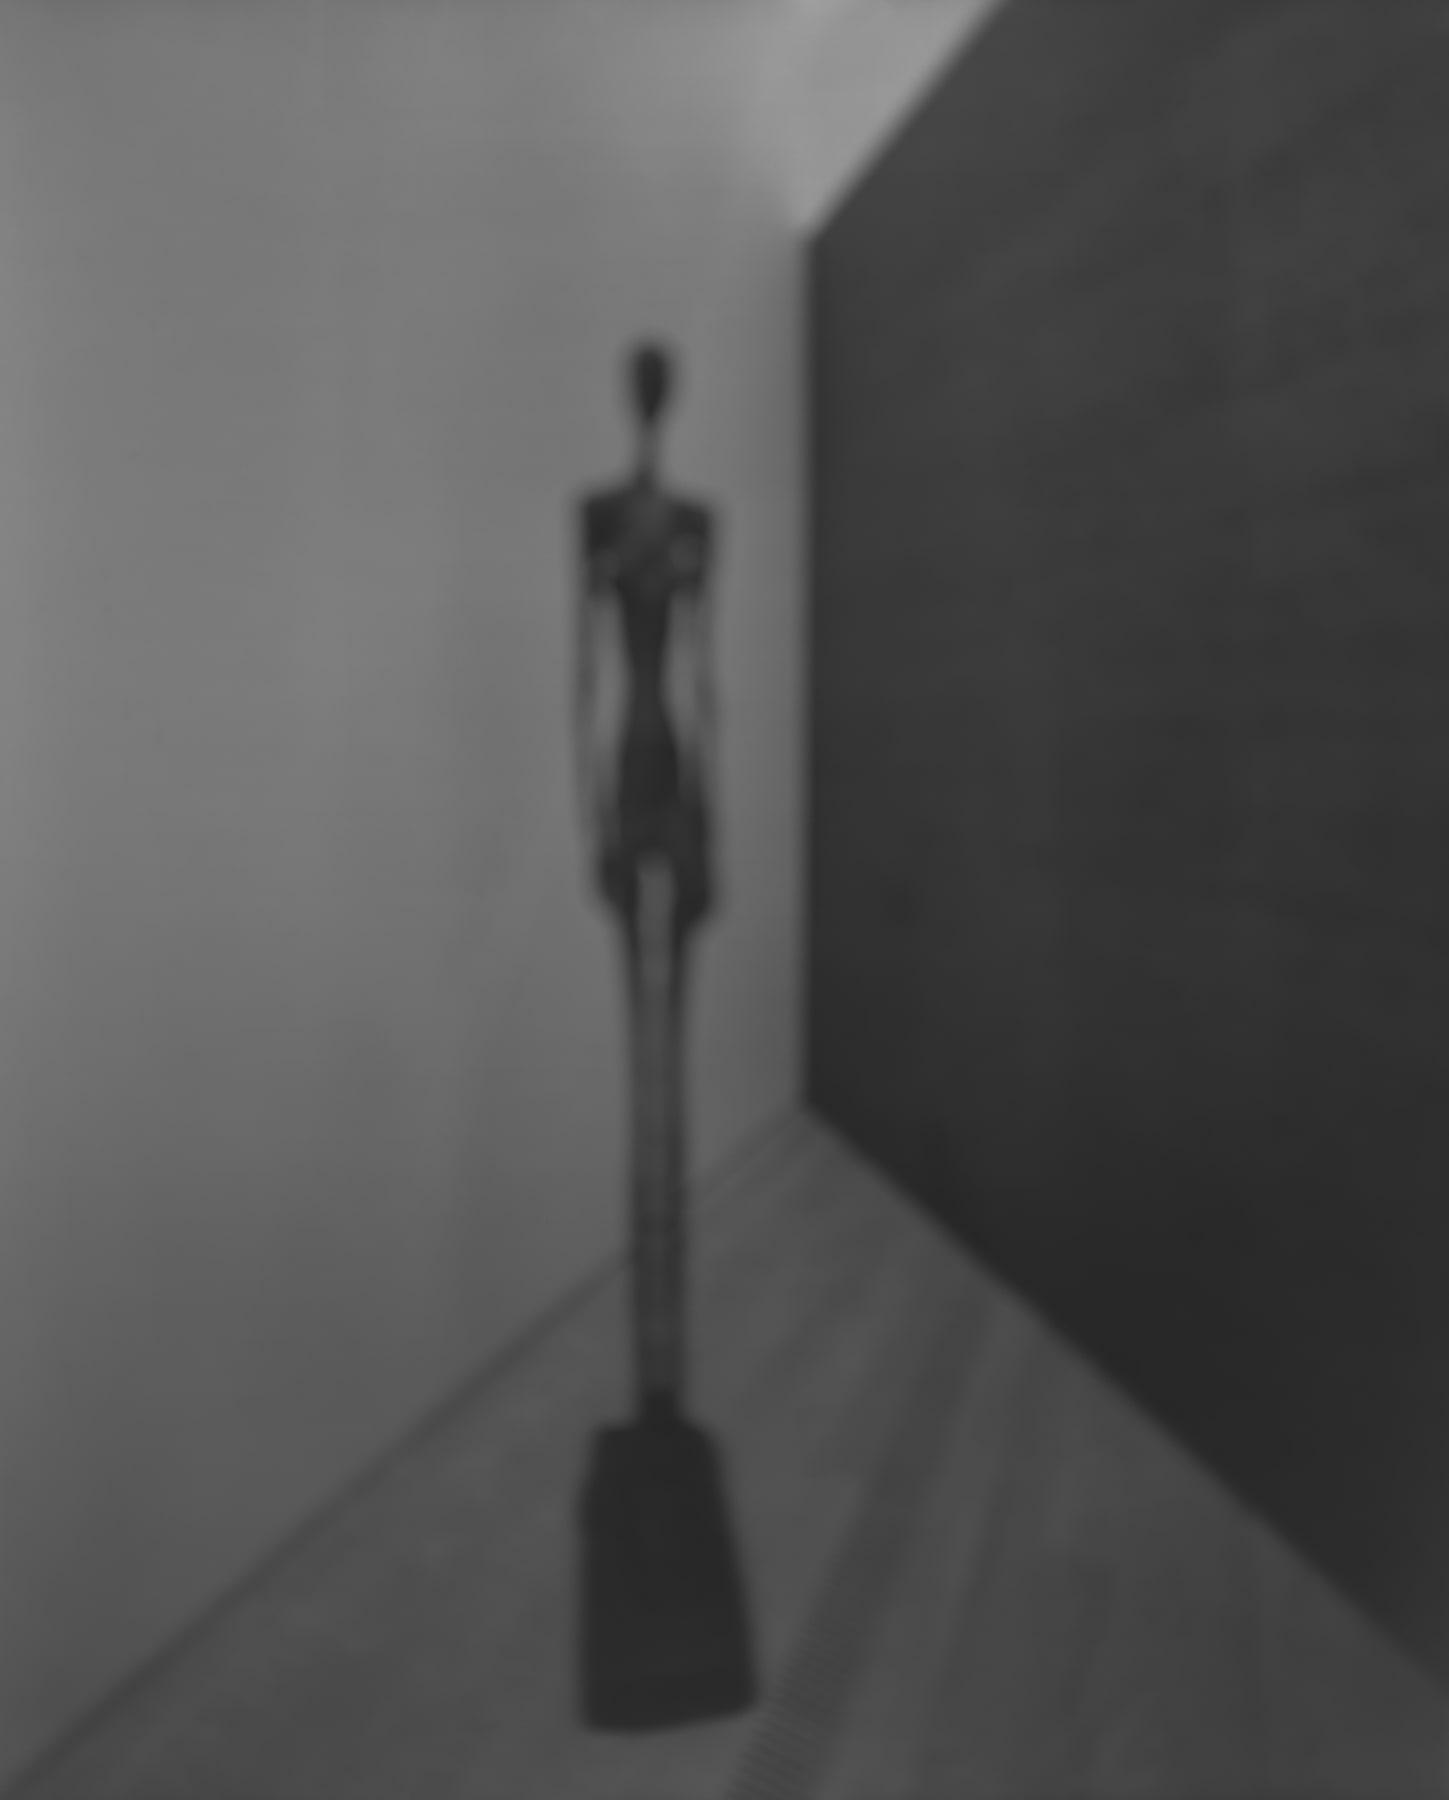 Hiroshi Sugimoto, Past Presence 070, Grand Femme III, Alberto Giacometti, 2016